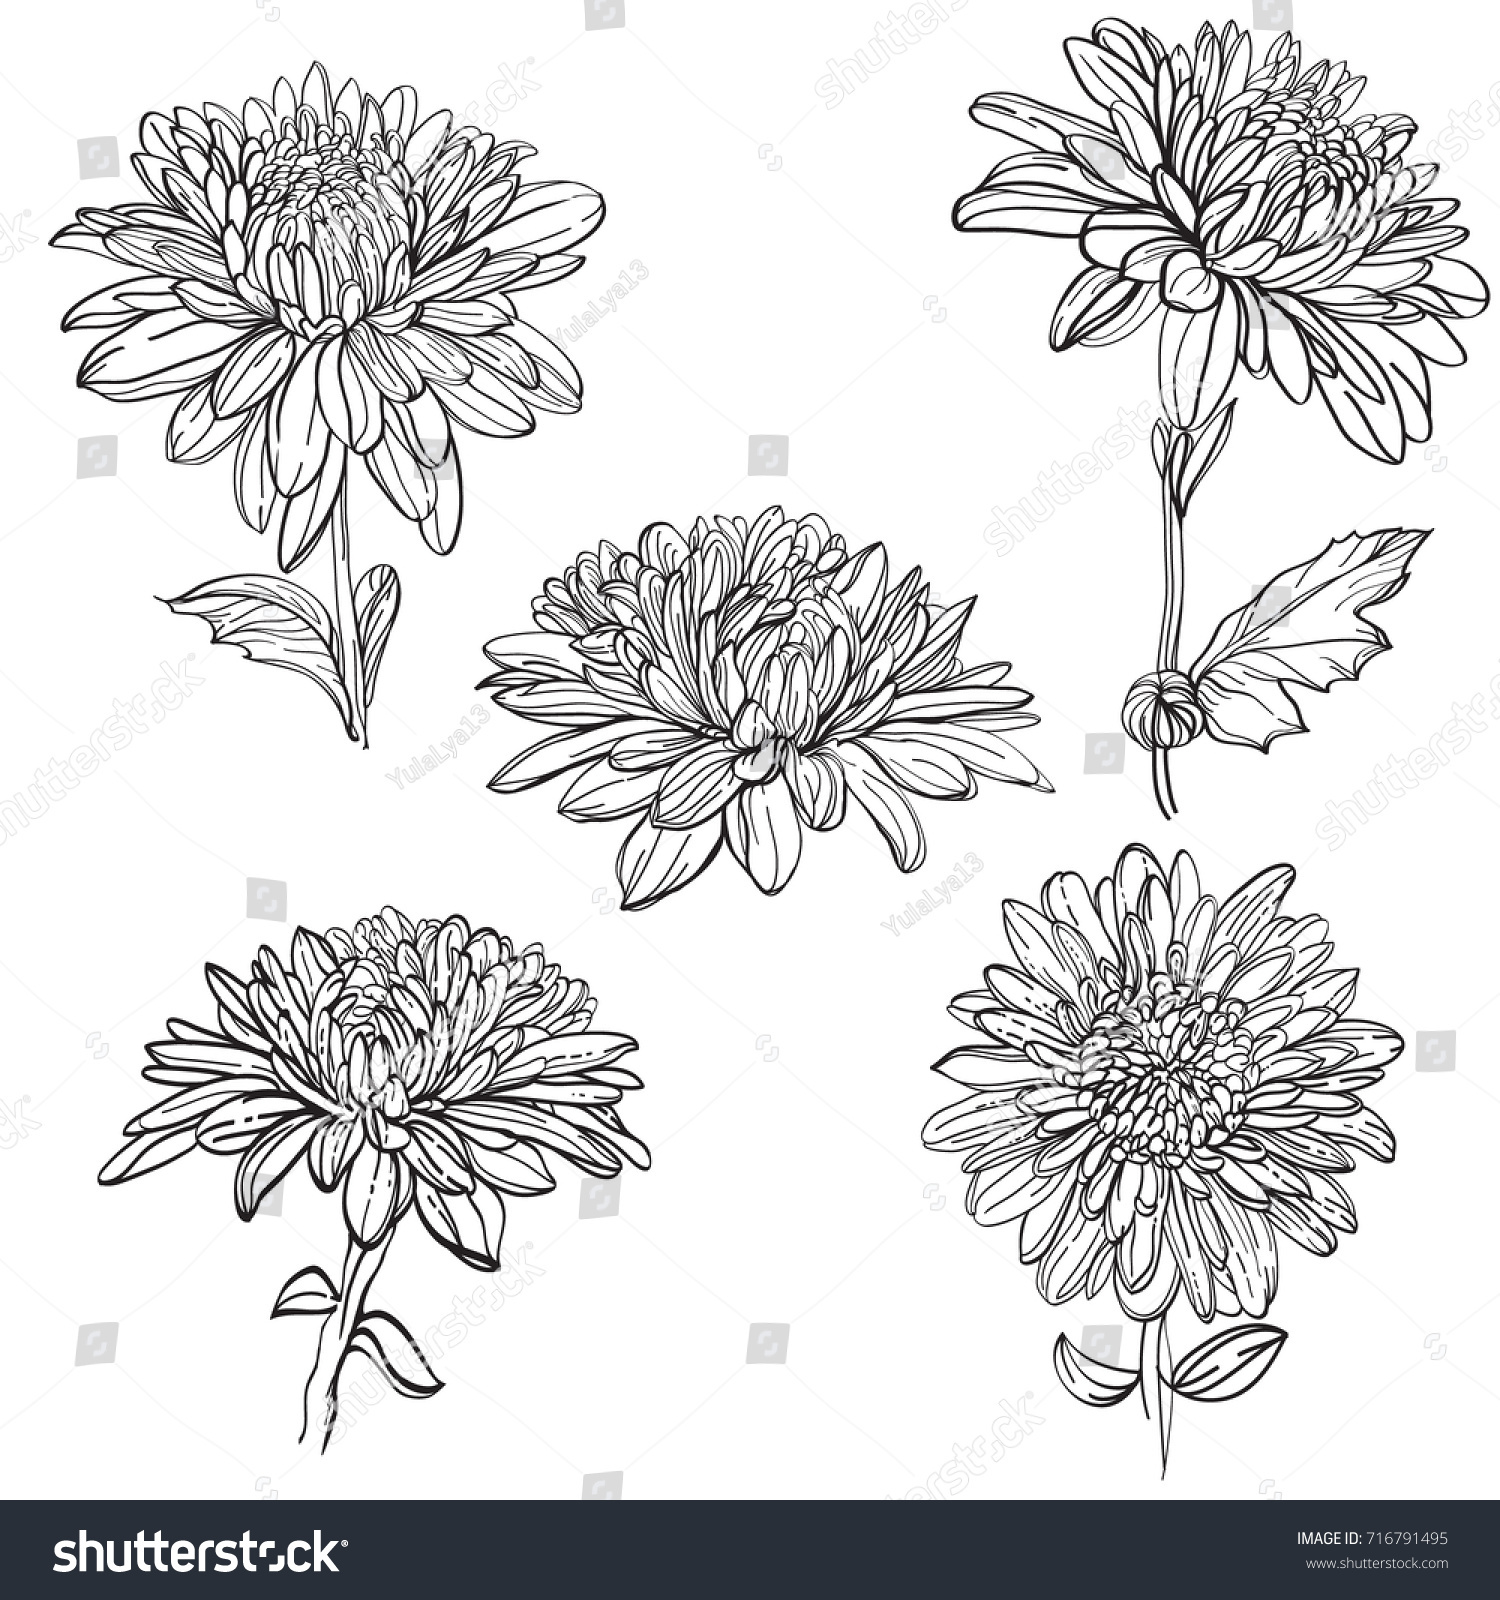 Set vector outline flowers chrysanthemum black stock vector set of vector outline flowers of chrysanthemum black and white line illustration of daisy flowers izmirmasajfo Choice Image